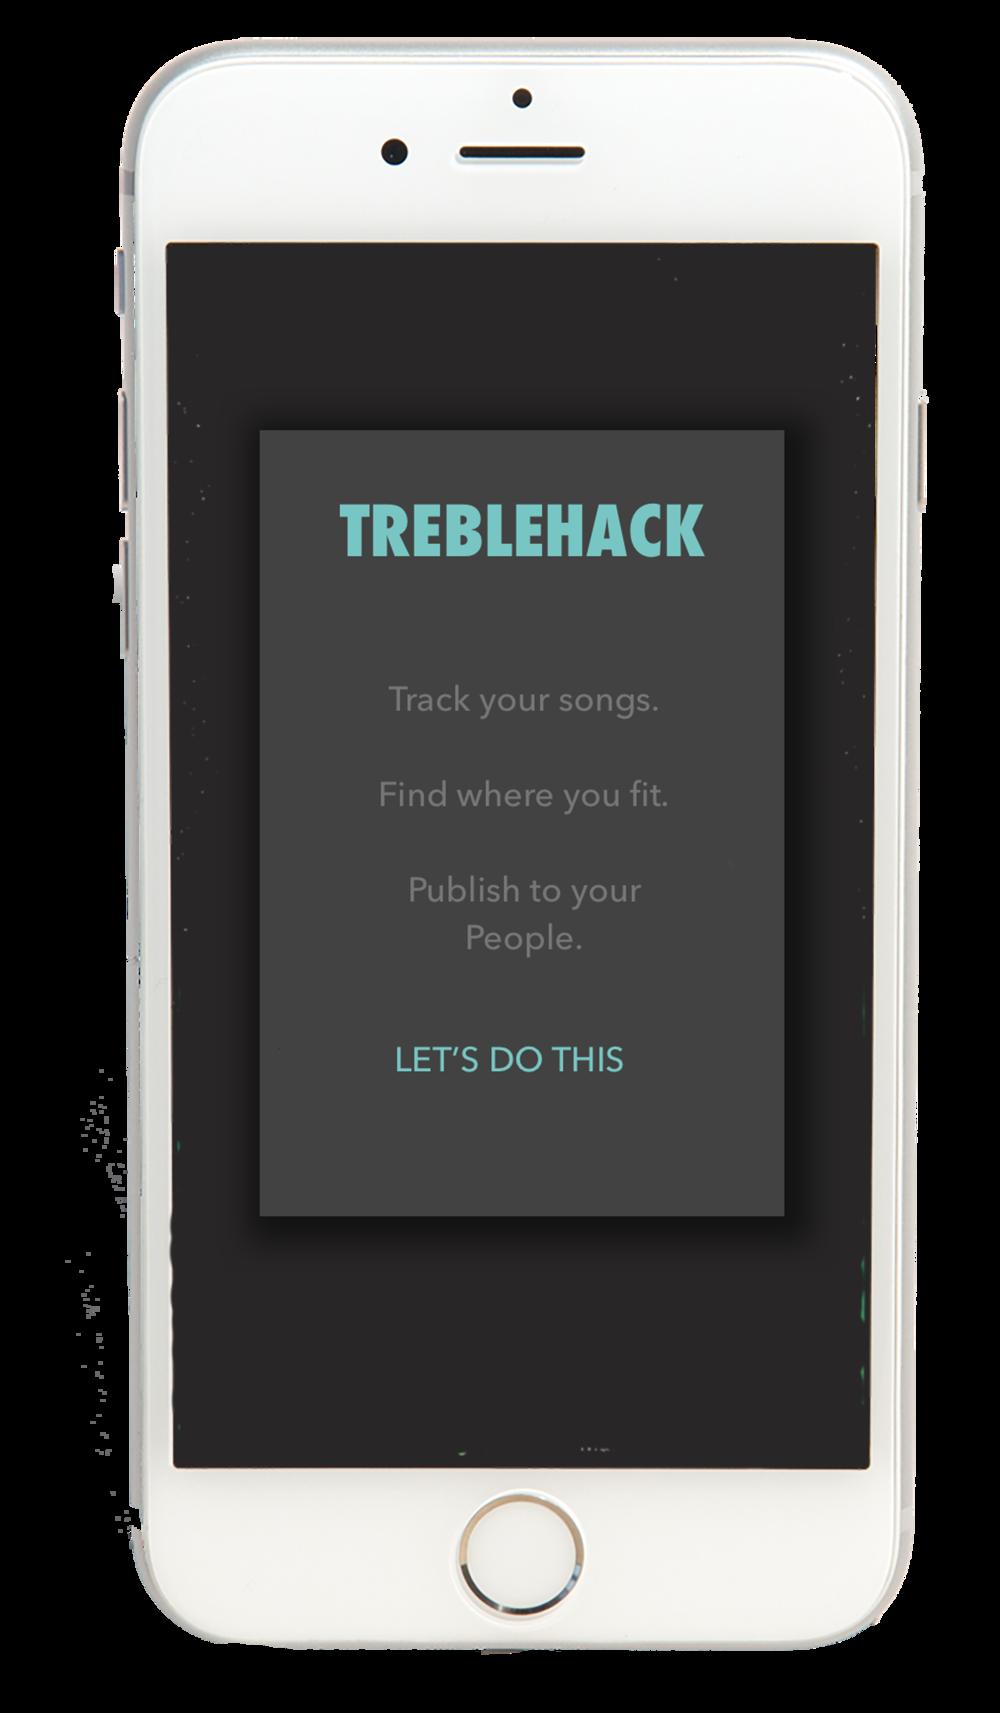 Treblehack_letsdothis.png